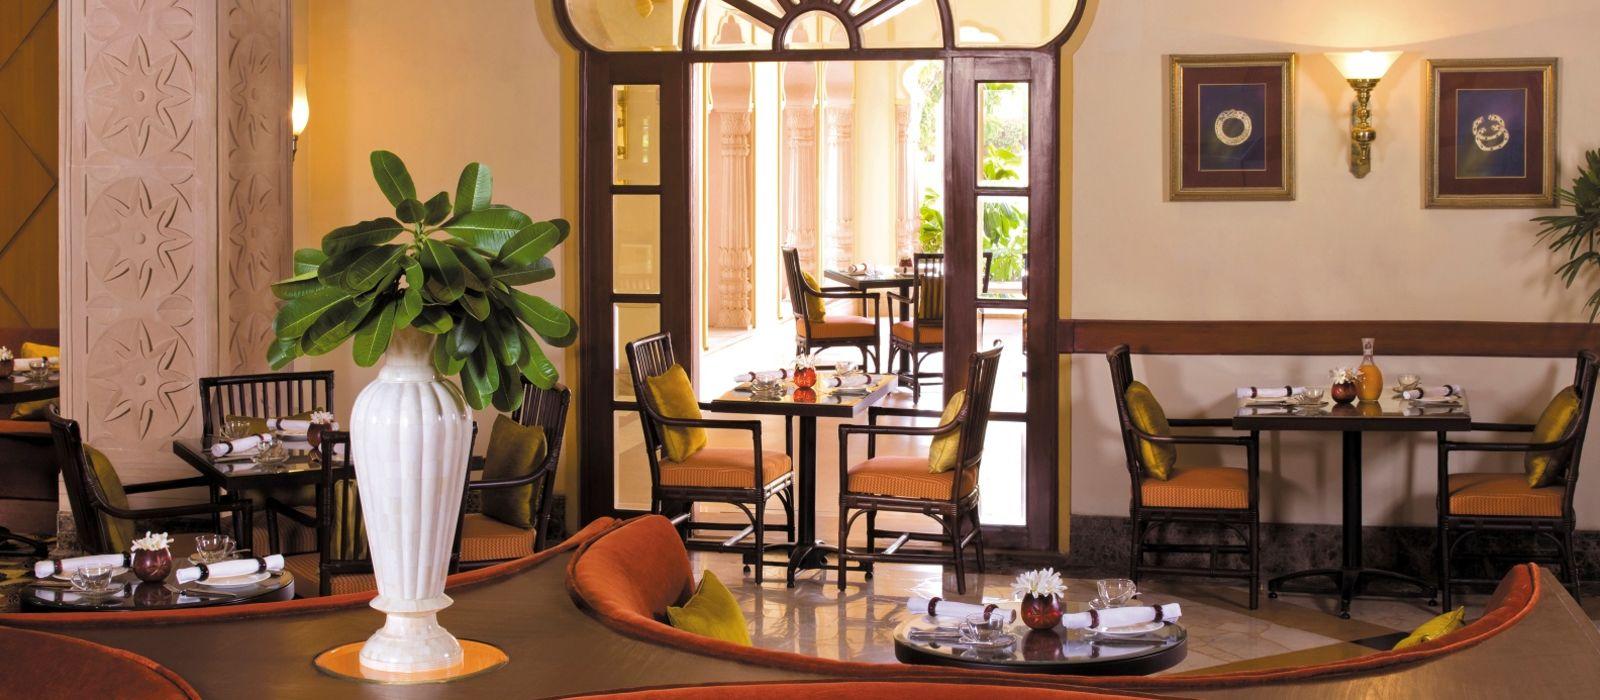 Hotel Vivanta by Taj – Hari Mahal North India